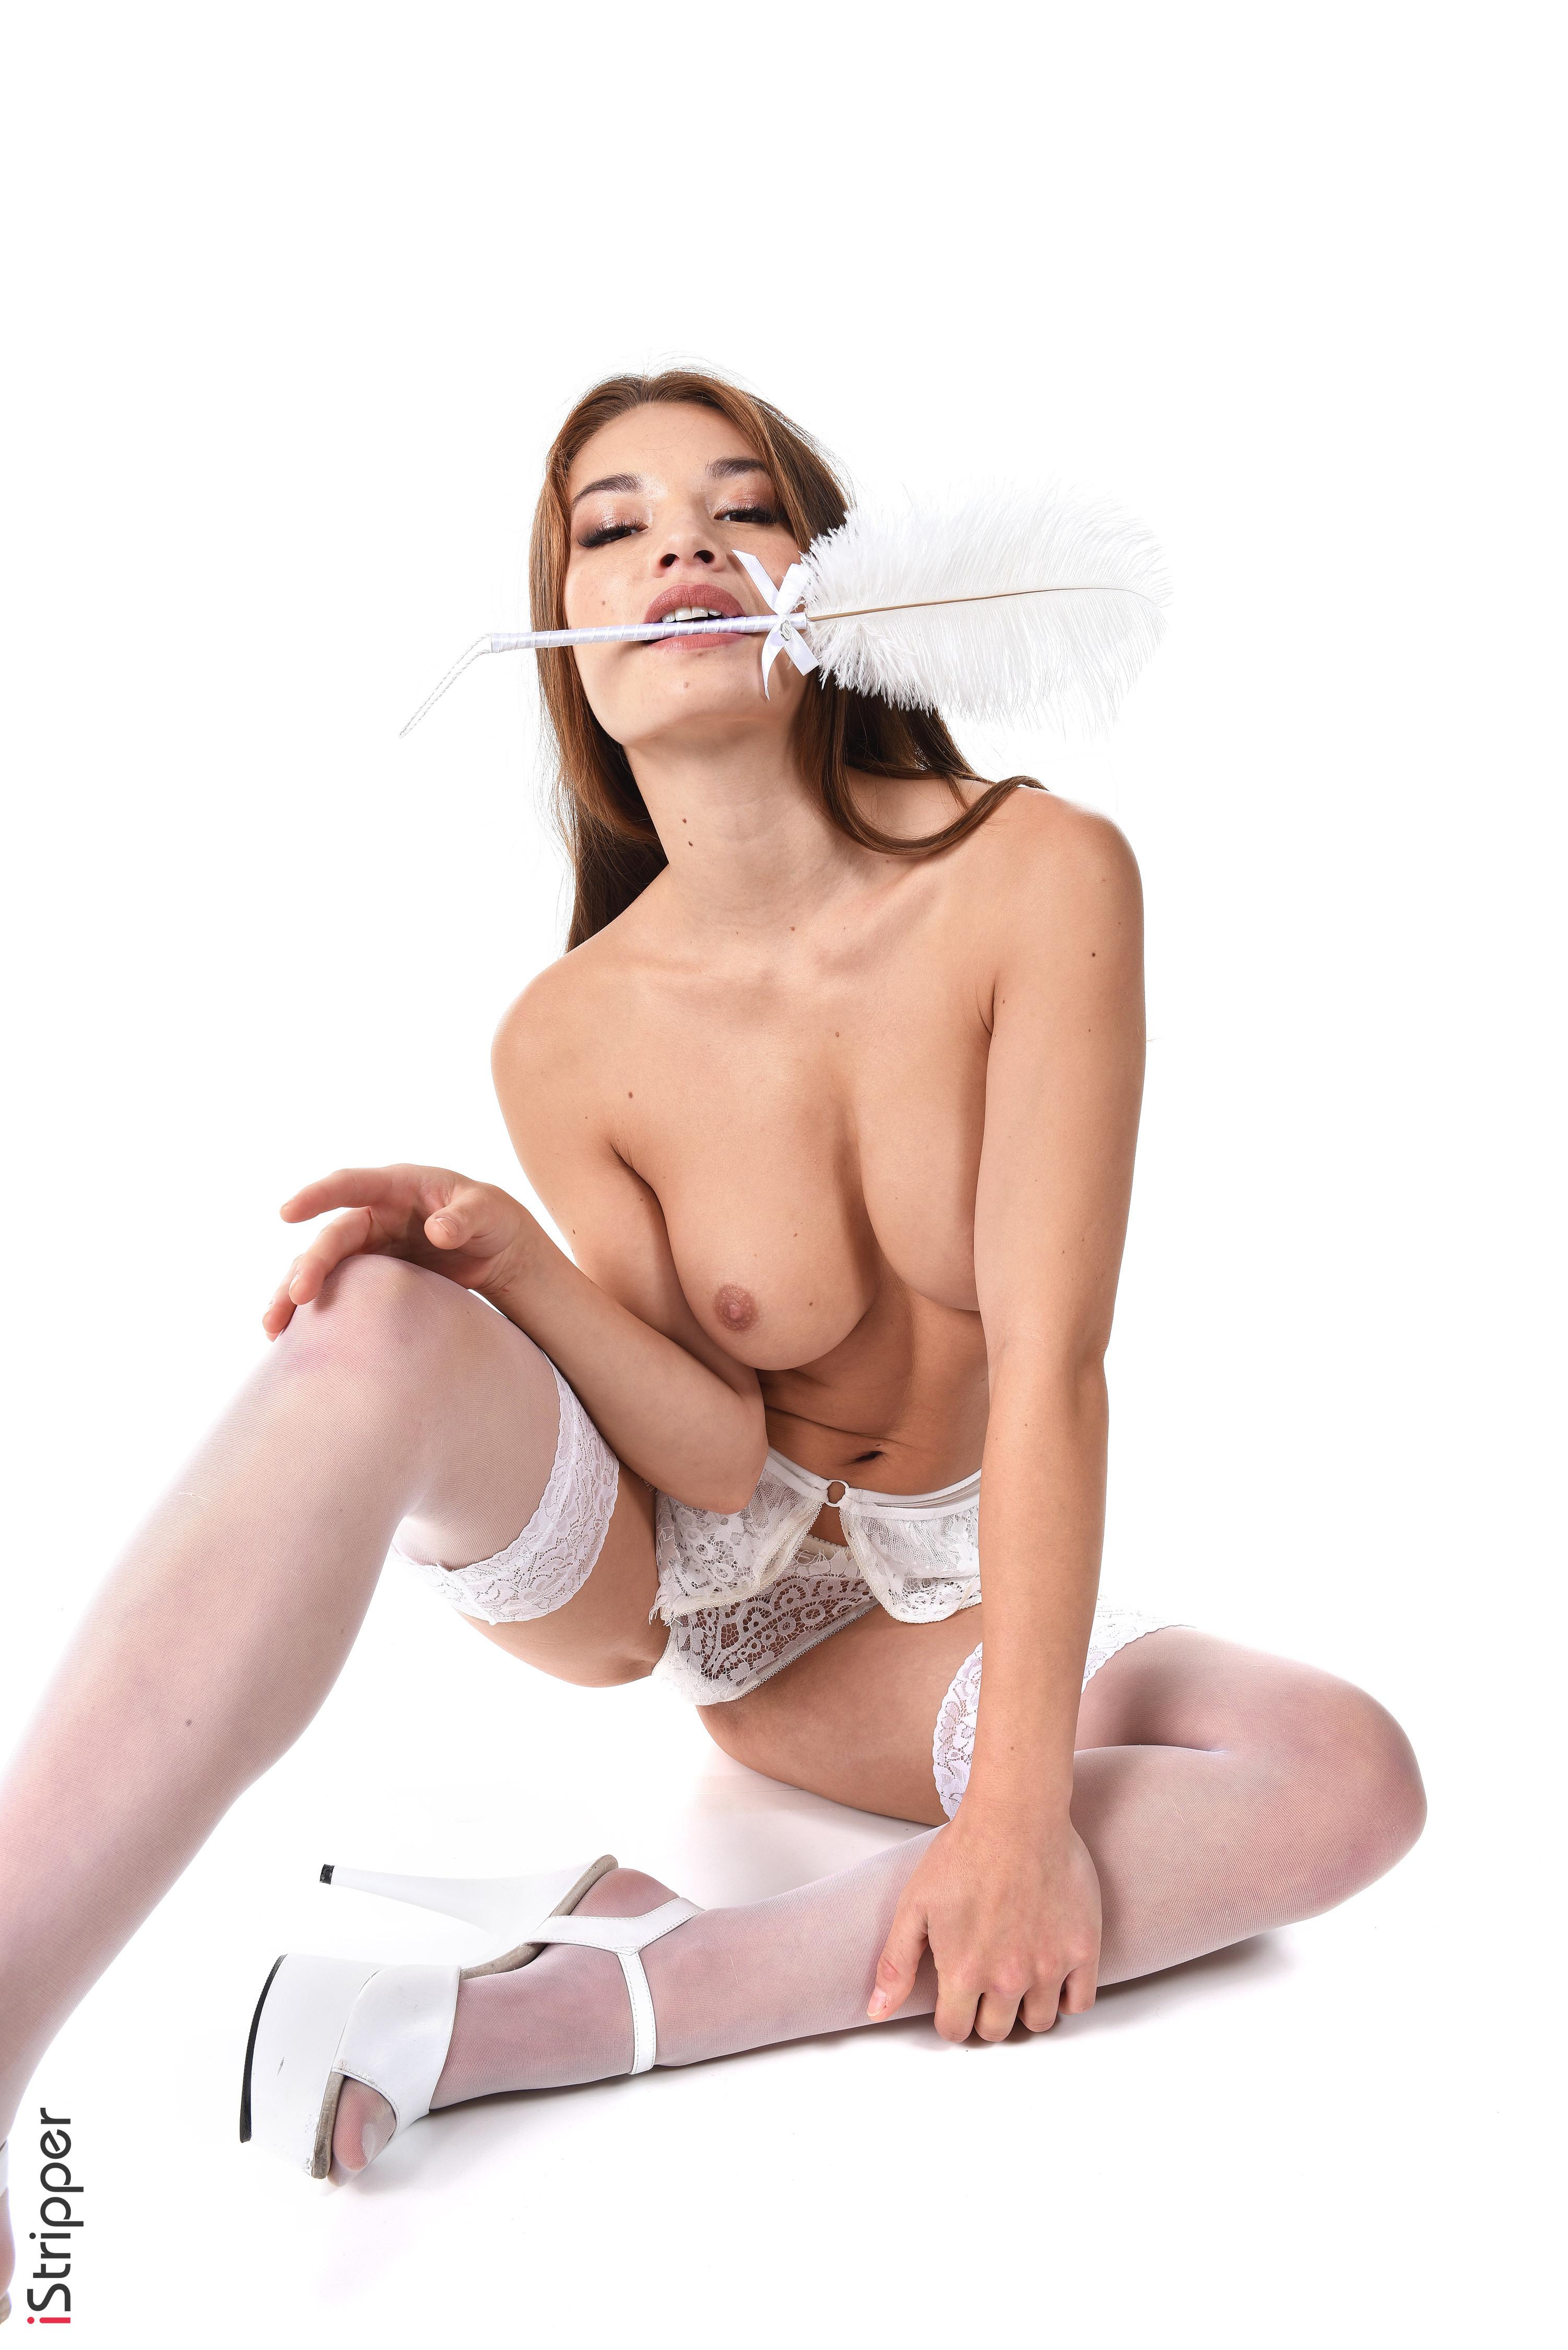 hot nude couple wallpaper